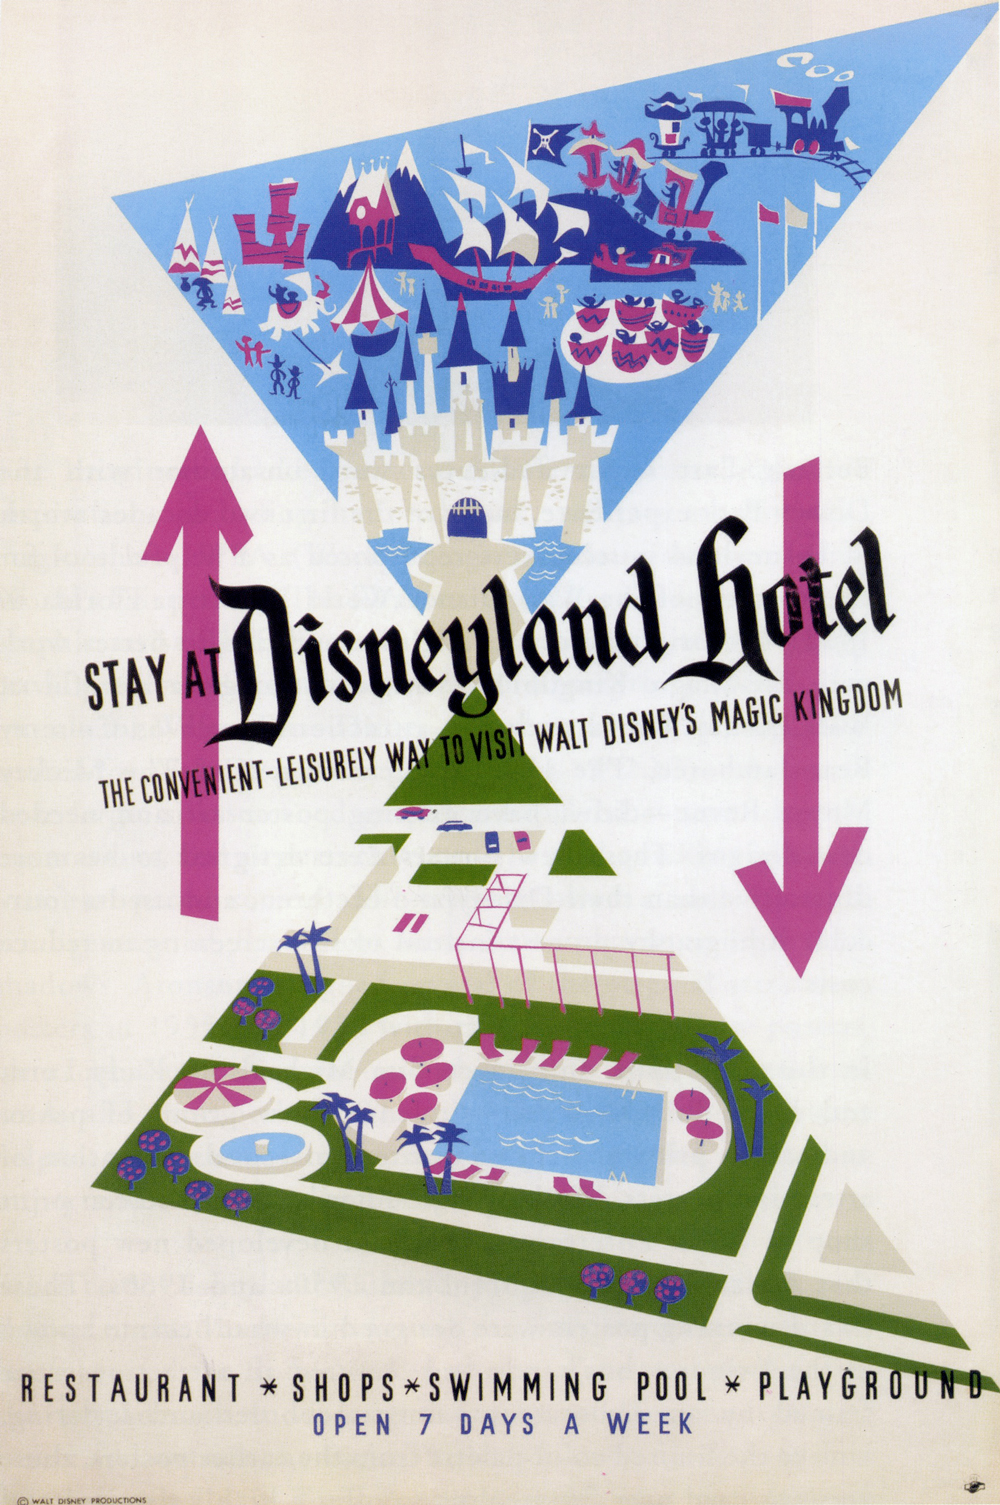 DisneyladHotel.jpg